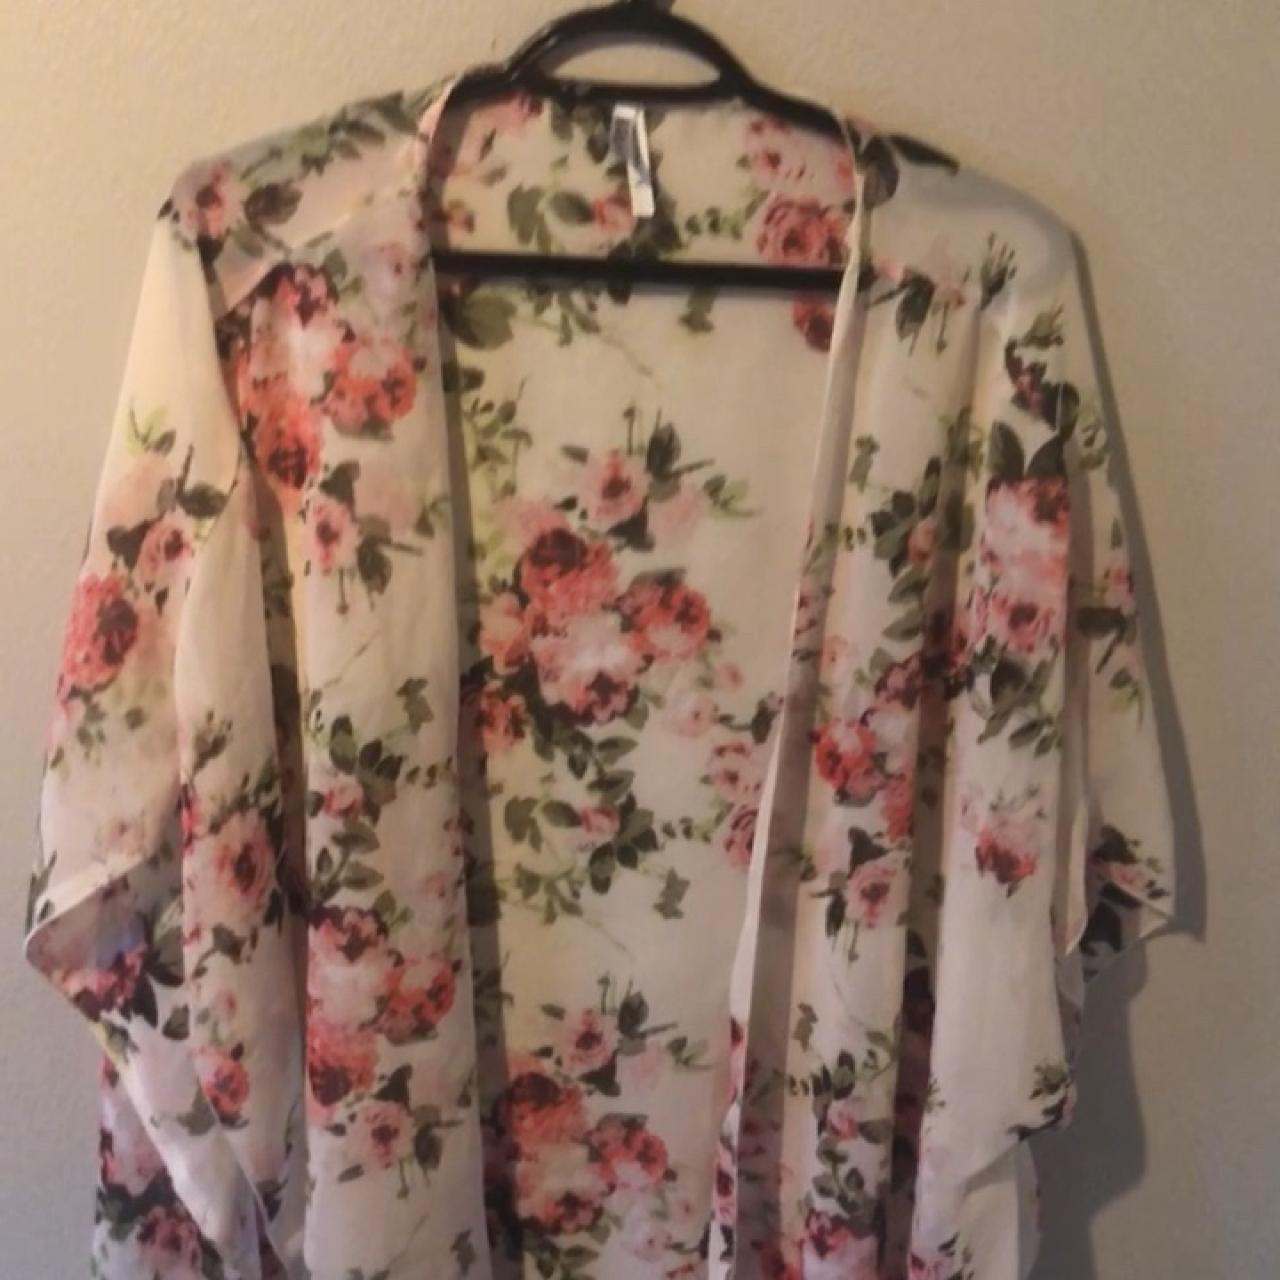 c368aa9ac Live 4 Truth Kimono / light cardigan. Size 2xl / xxl. could - Depop